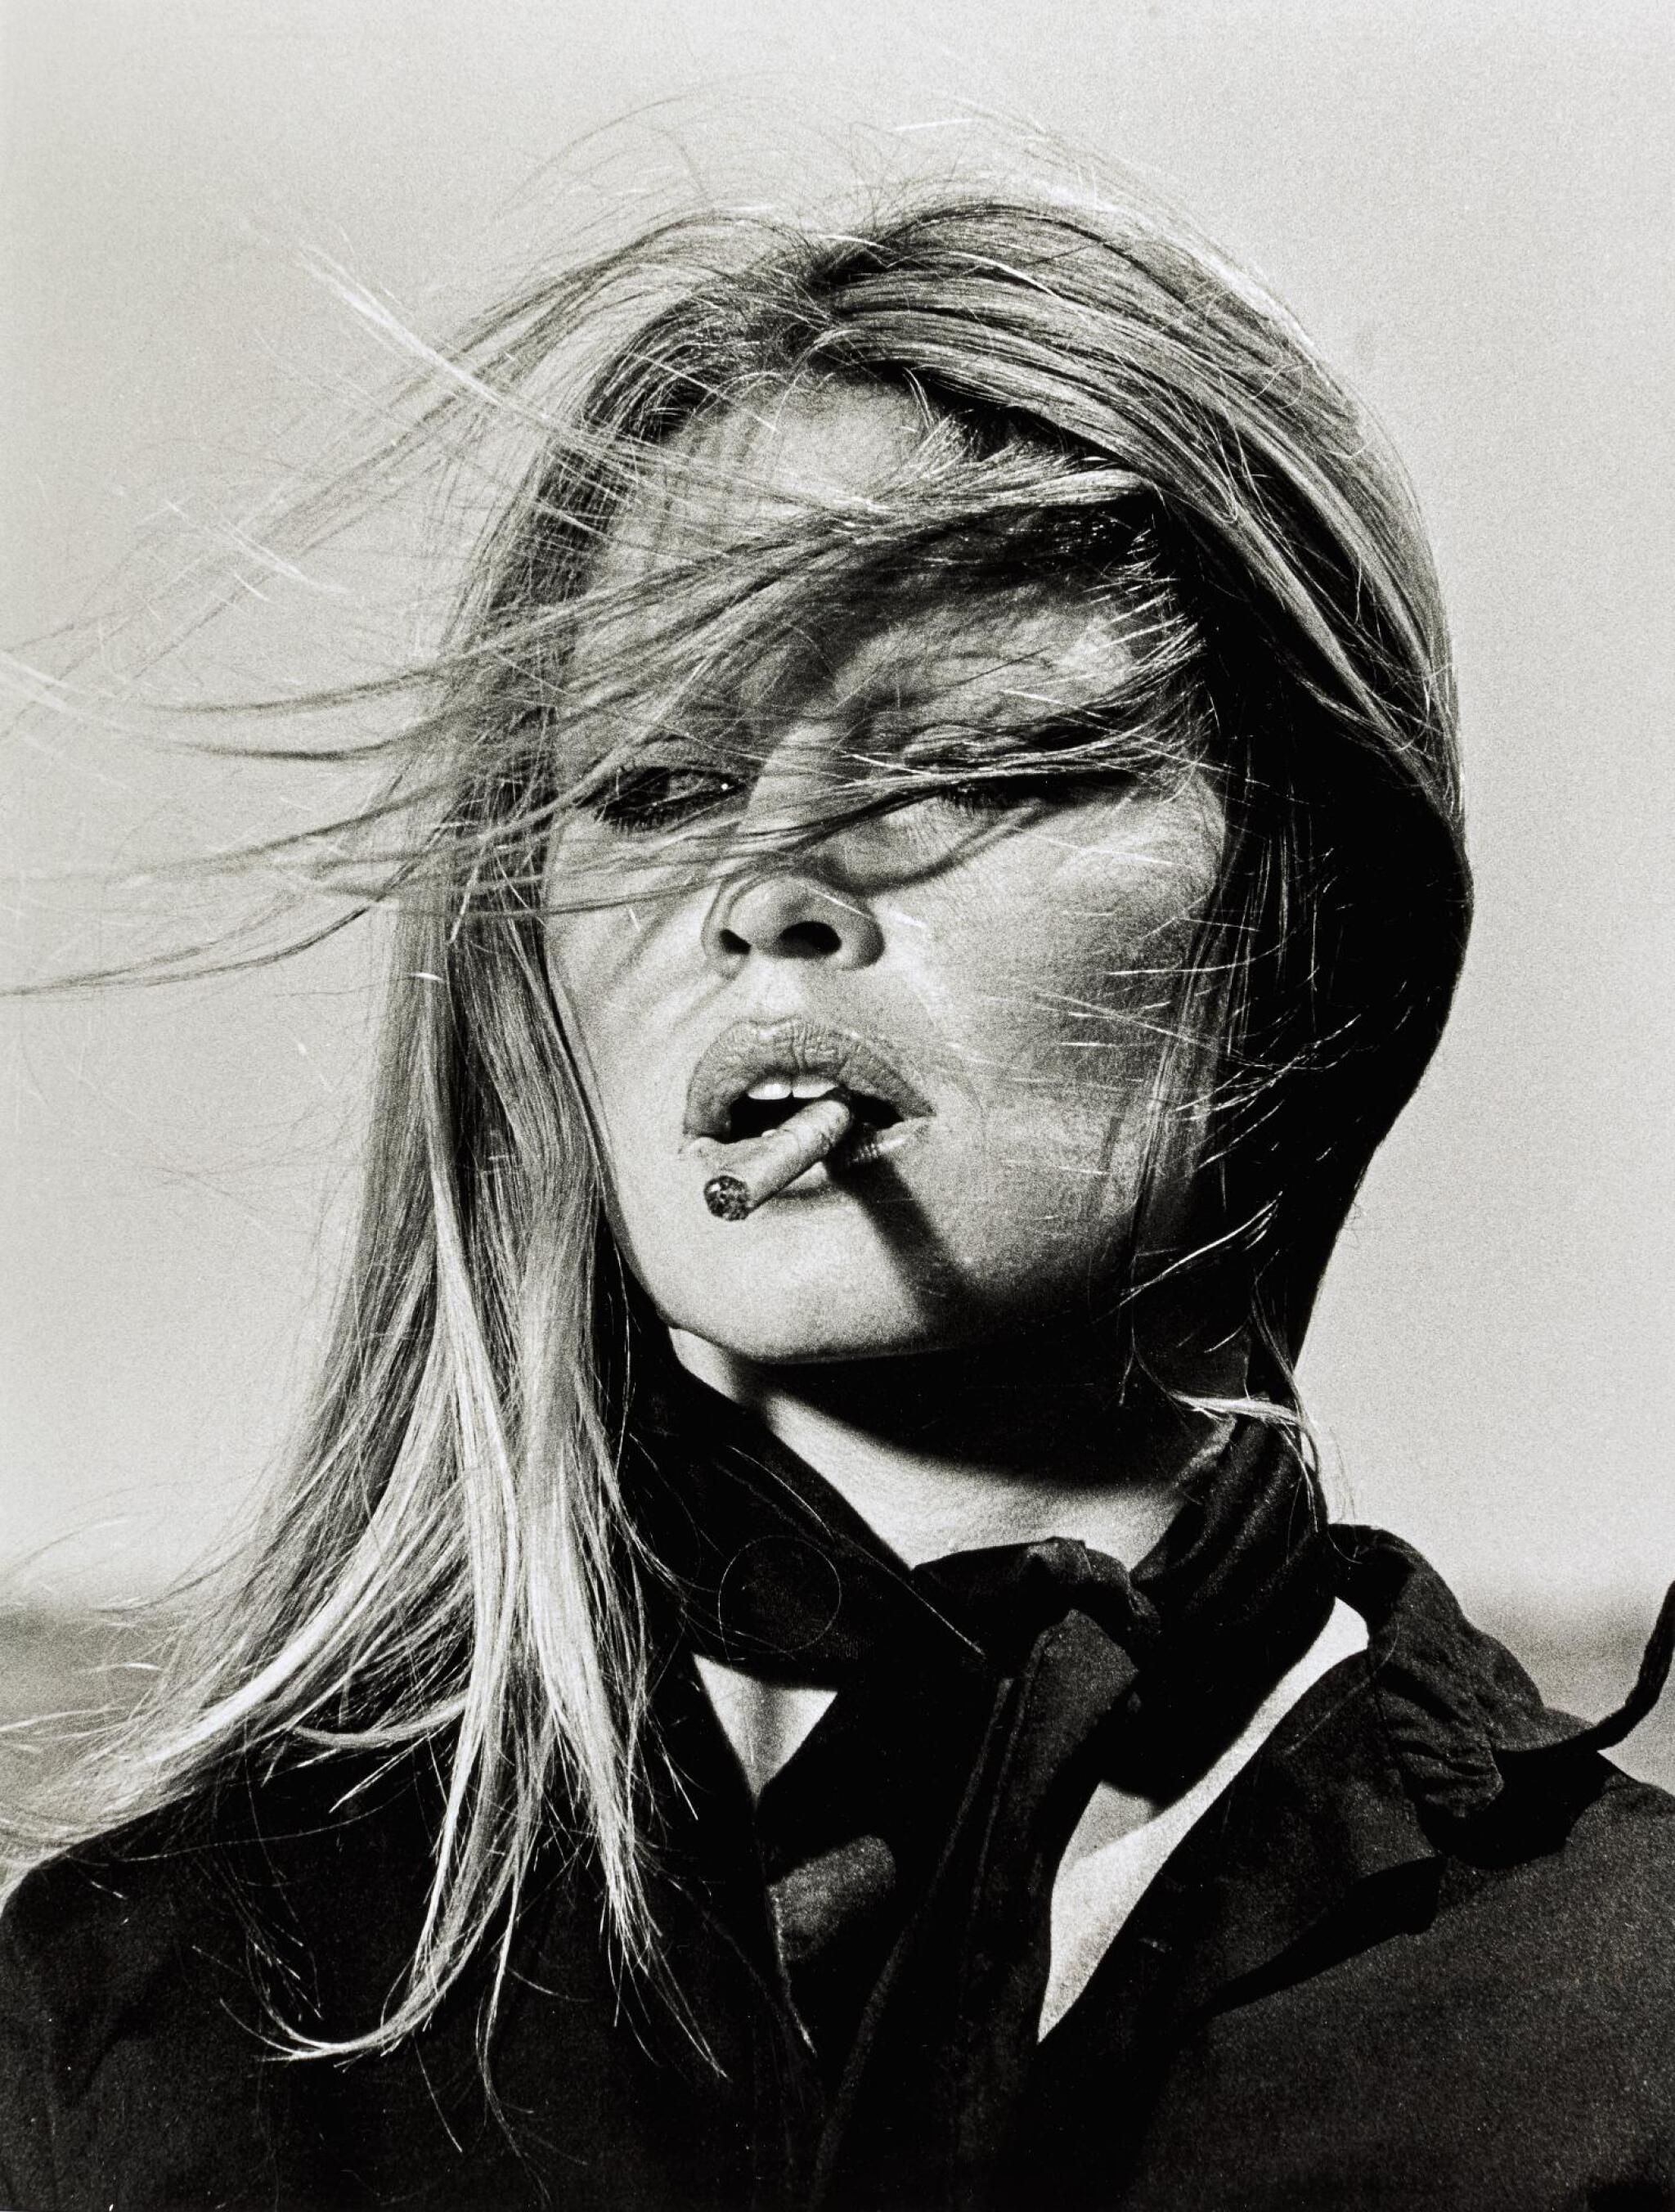 TERRY O'NEILL | 'BRIGITTE BARDOT', SPAIN, 1971